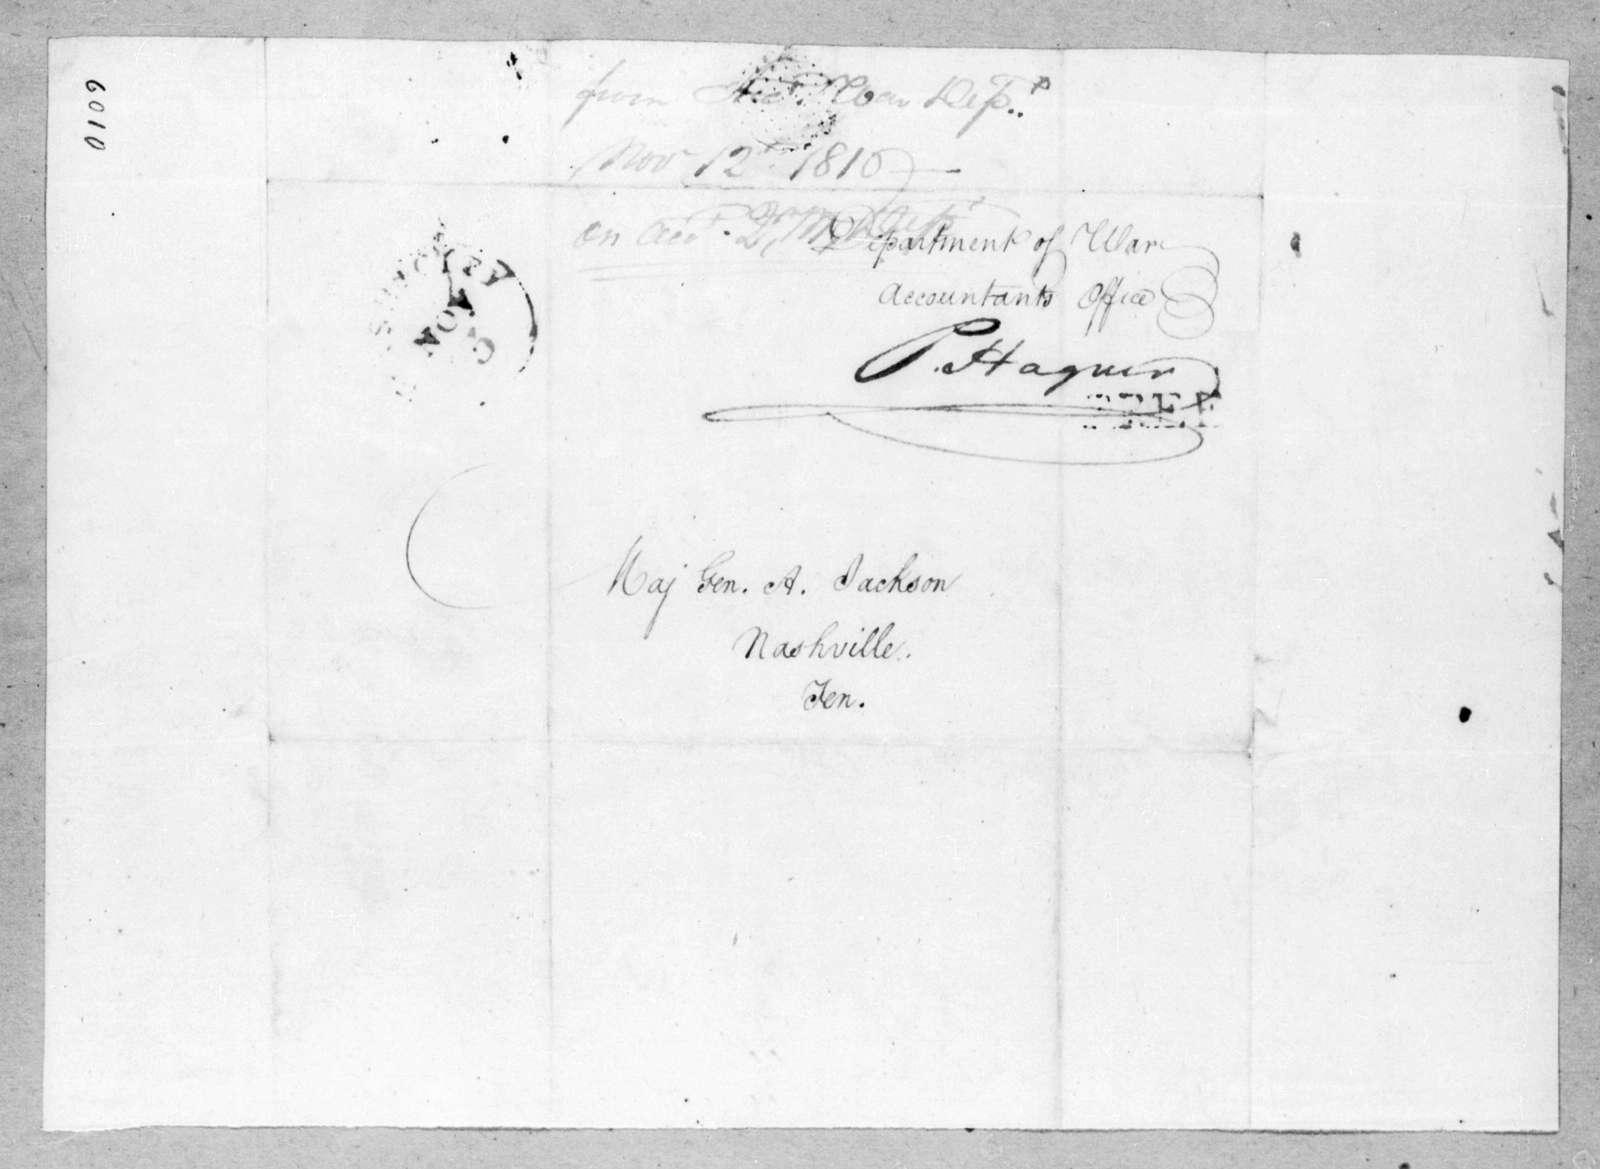 Peter Hagner to Andrew Jackson, November 12, 1816